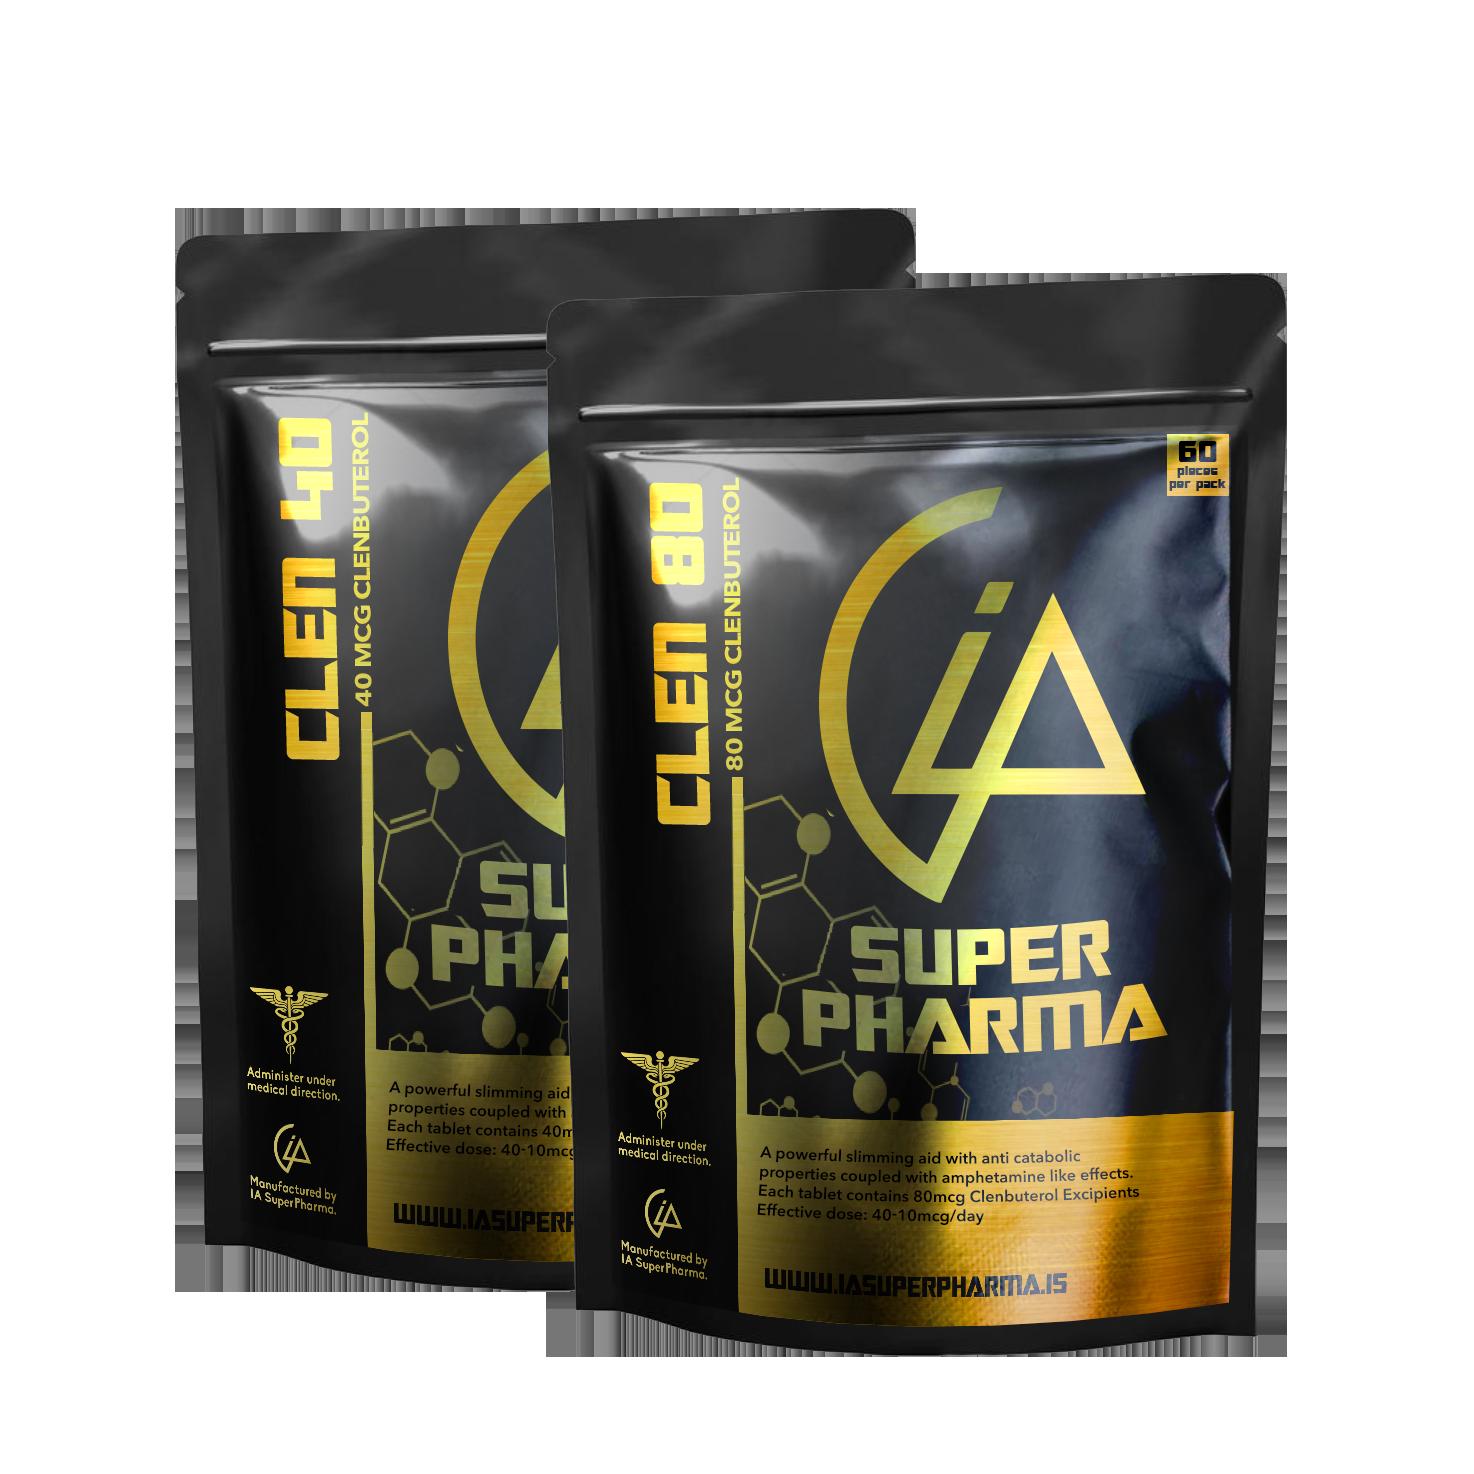 Clenbuterol (Spiropent) IA Superpharma – Best Anabolic Steroids Online IA Superpharma